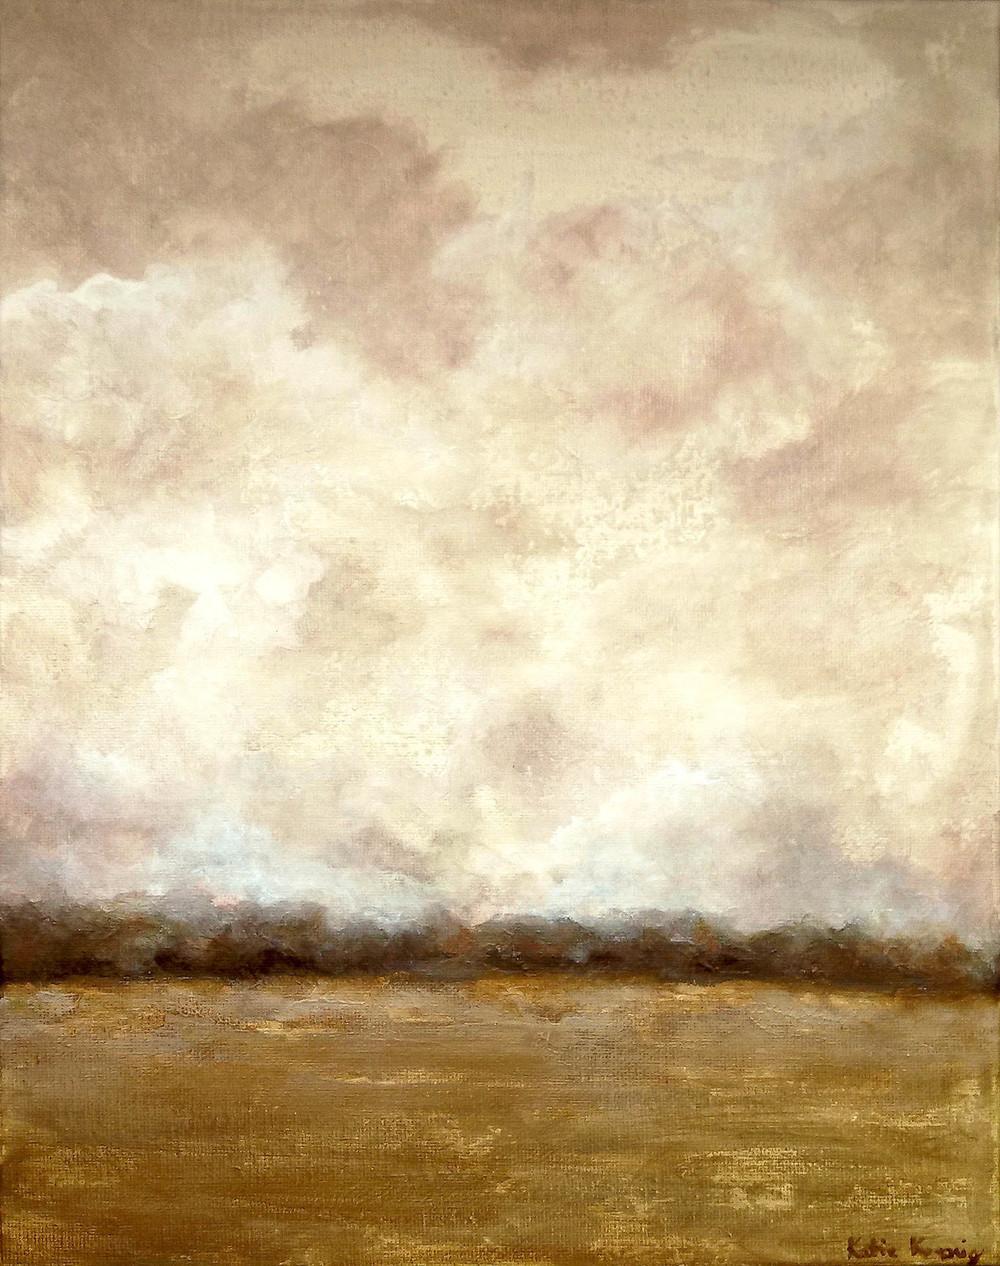 Dawning Mist